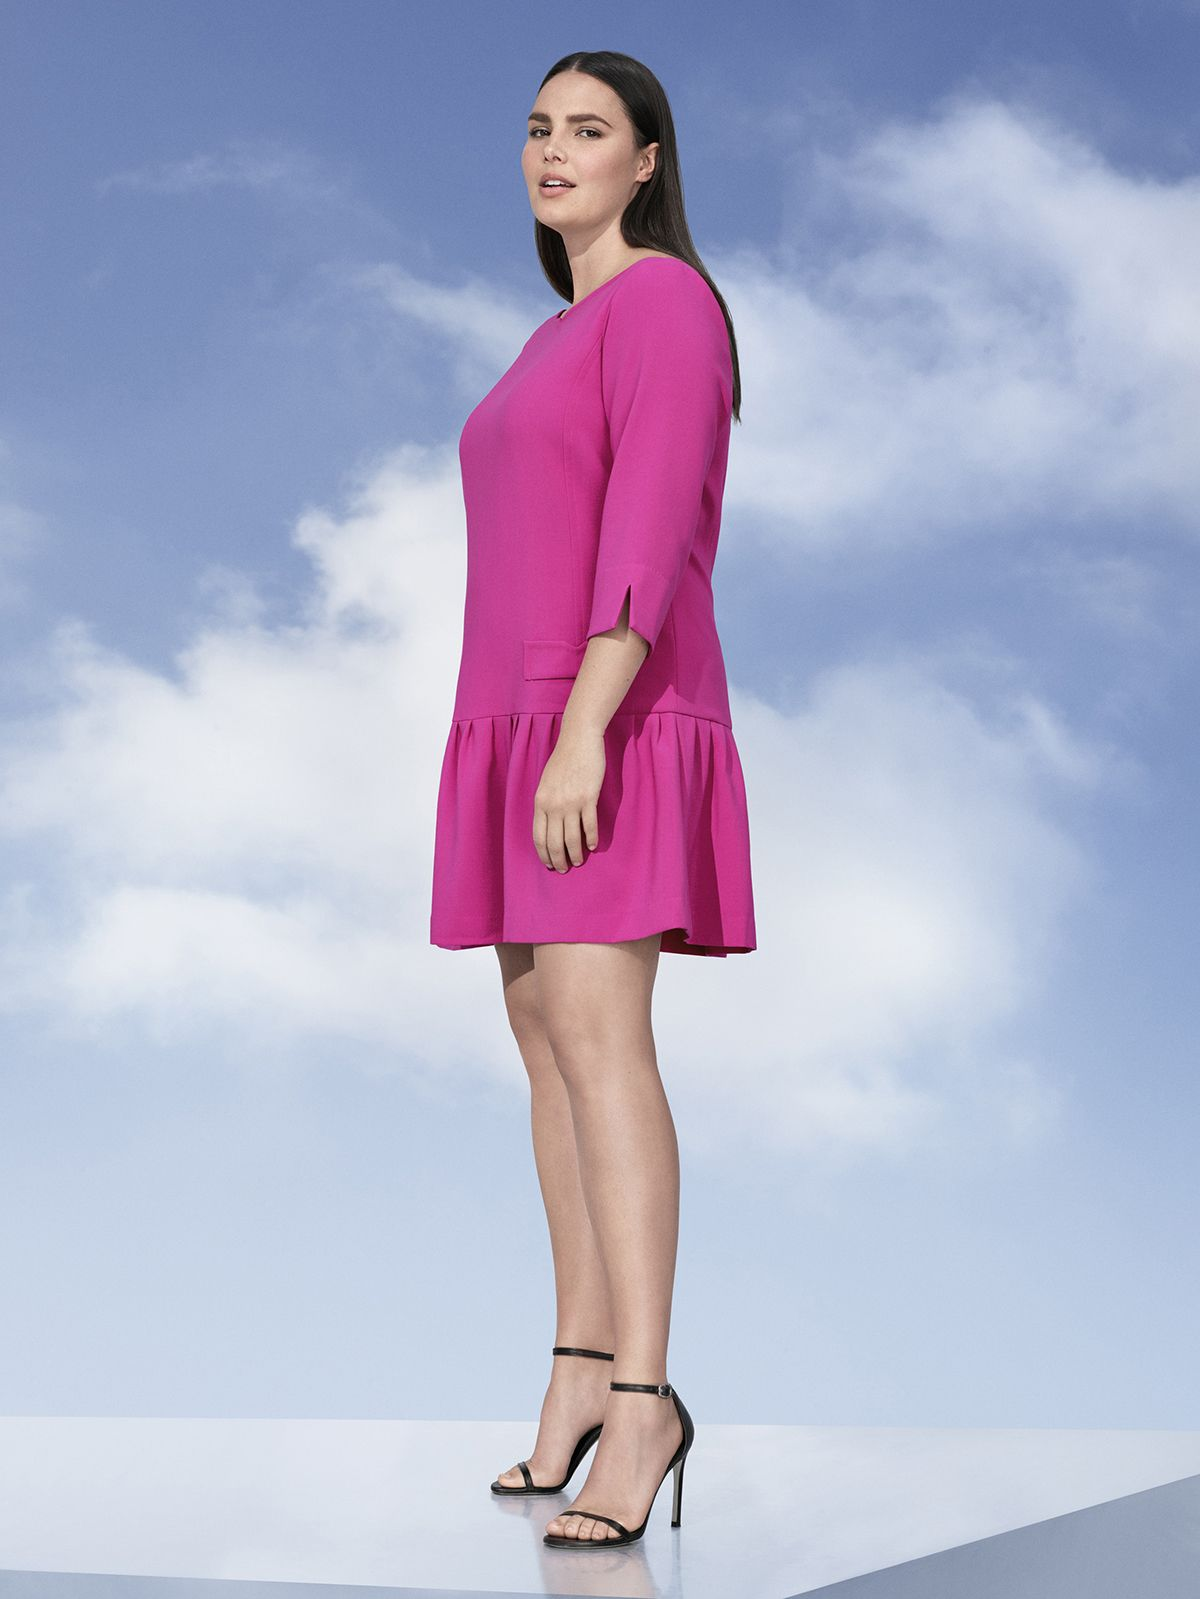 69accb5402 Plus Size Skirts Target